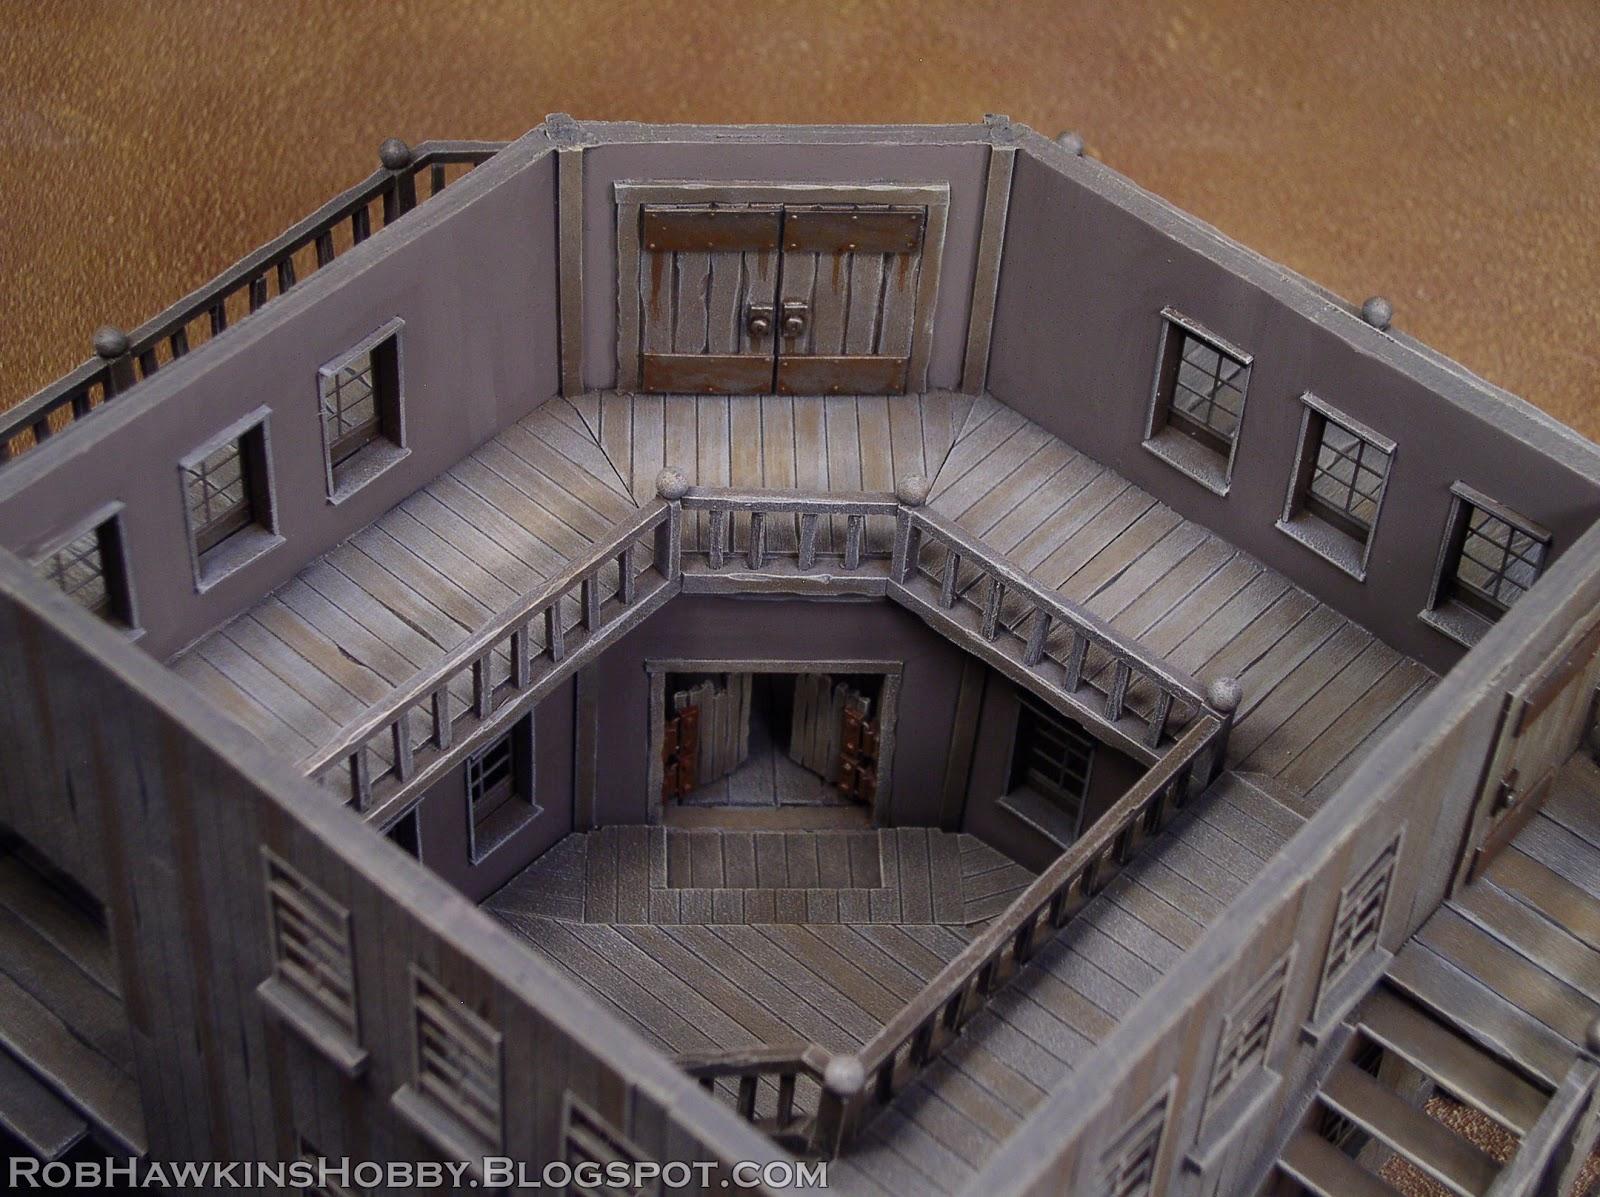 Rob Hawkins Hobby Wwx Terrain A Look Inside Part 2